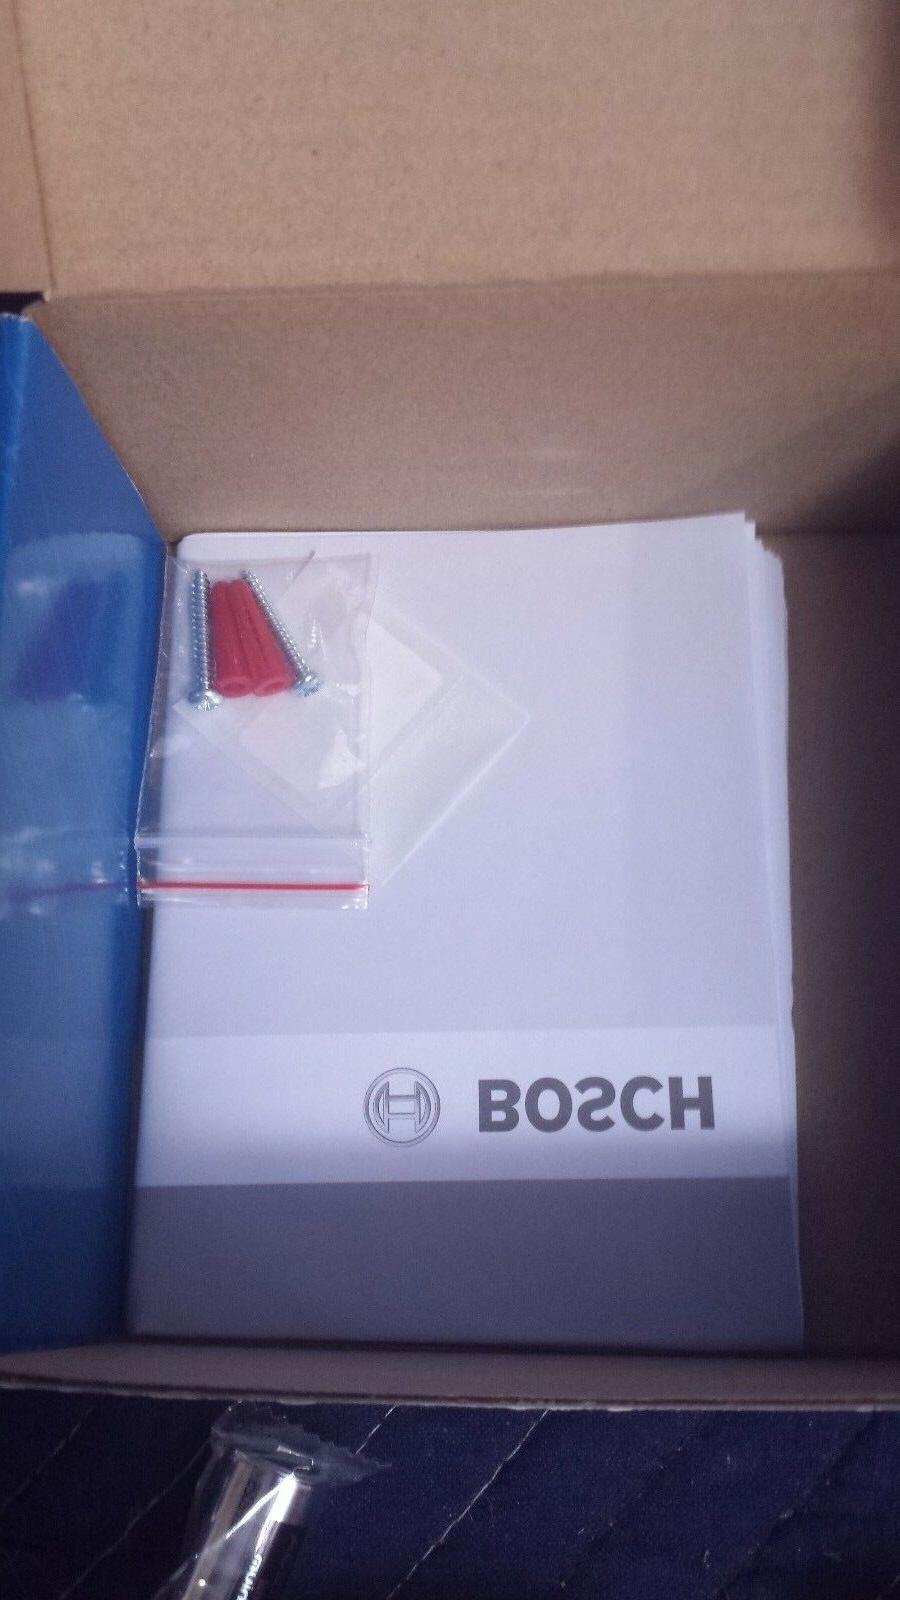 Bosch RFSM‑A Smoke